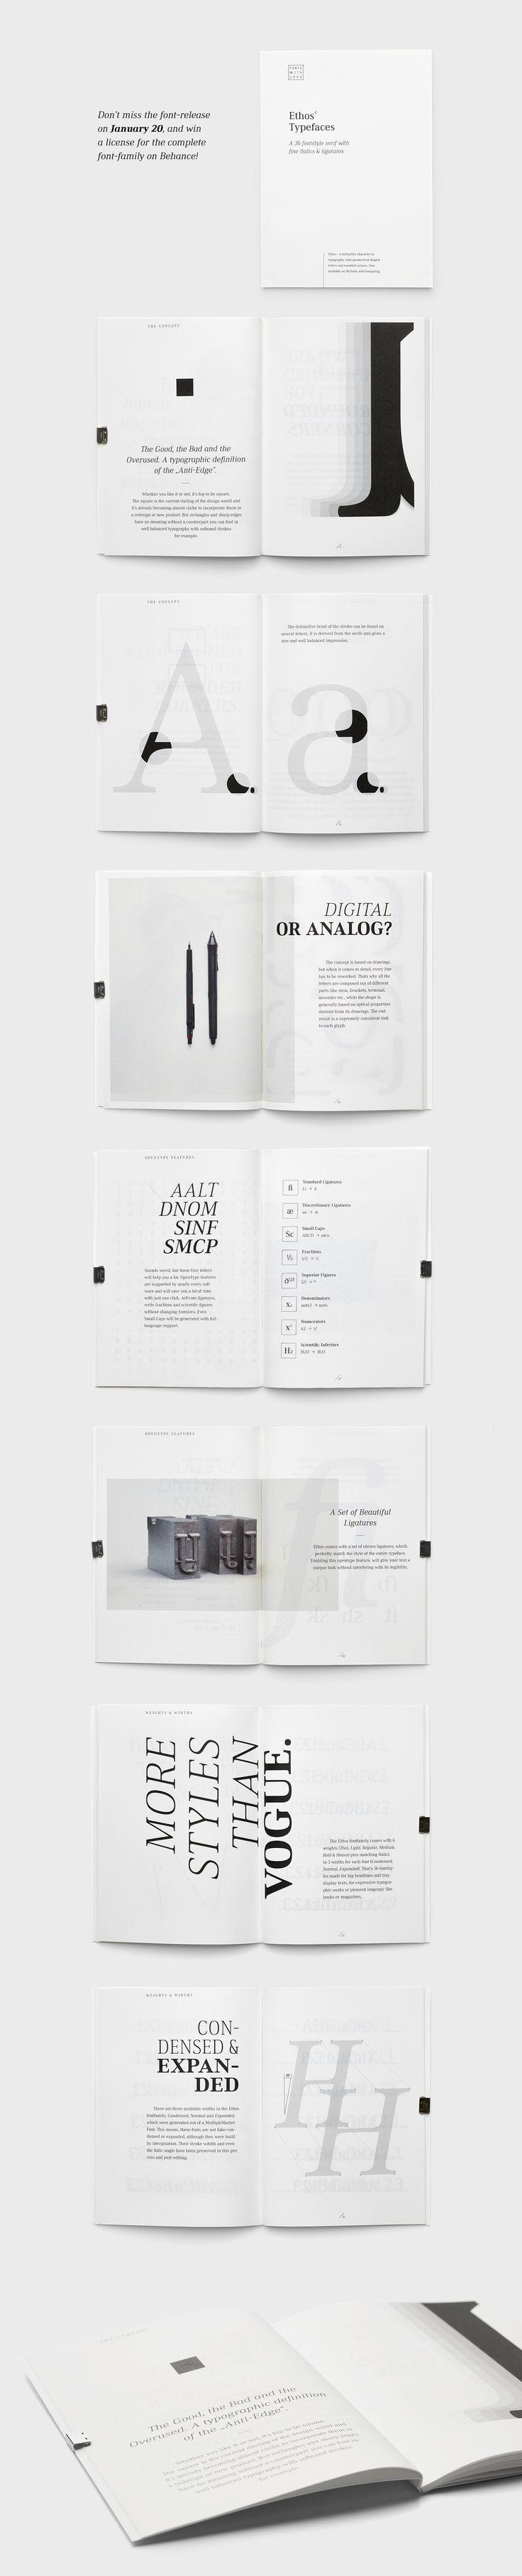 Ethos Typefaces – Specimen Book on Behance